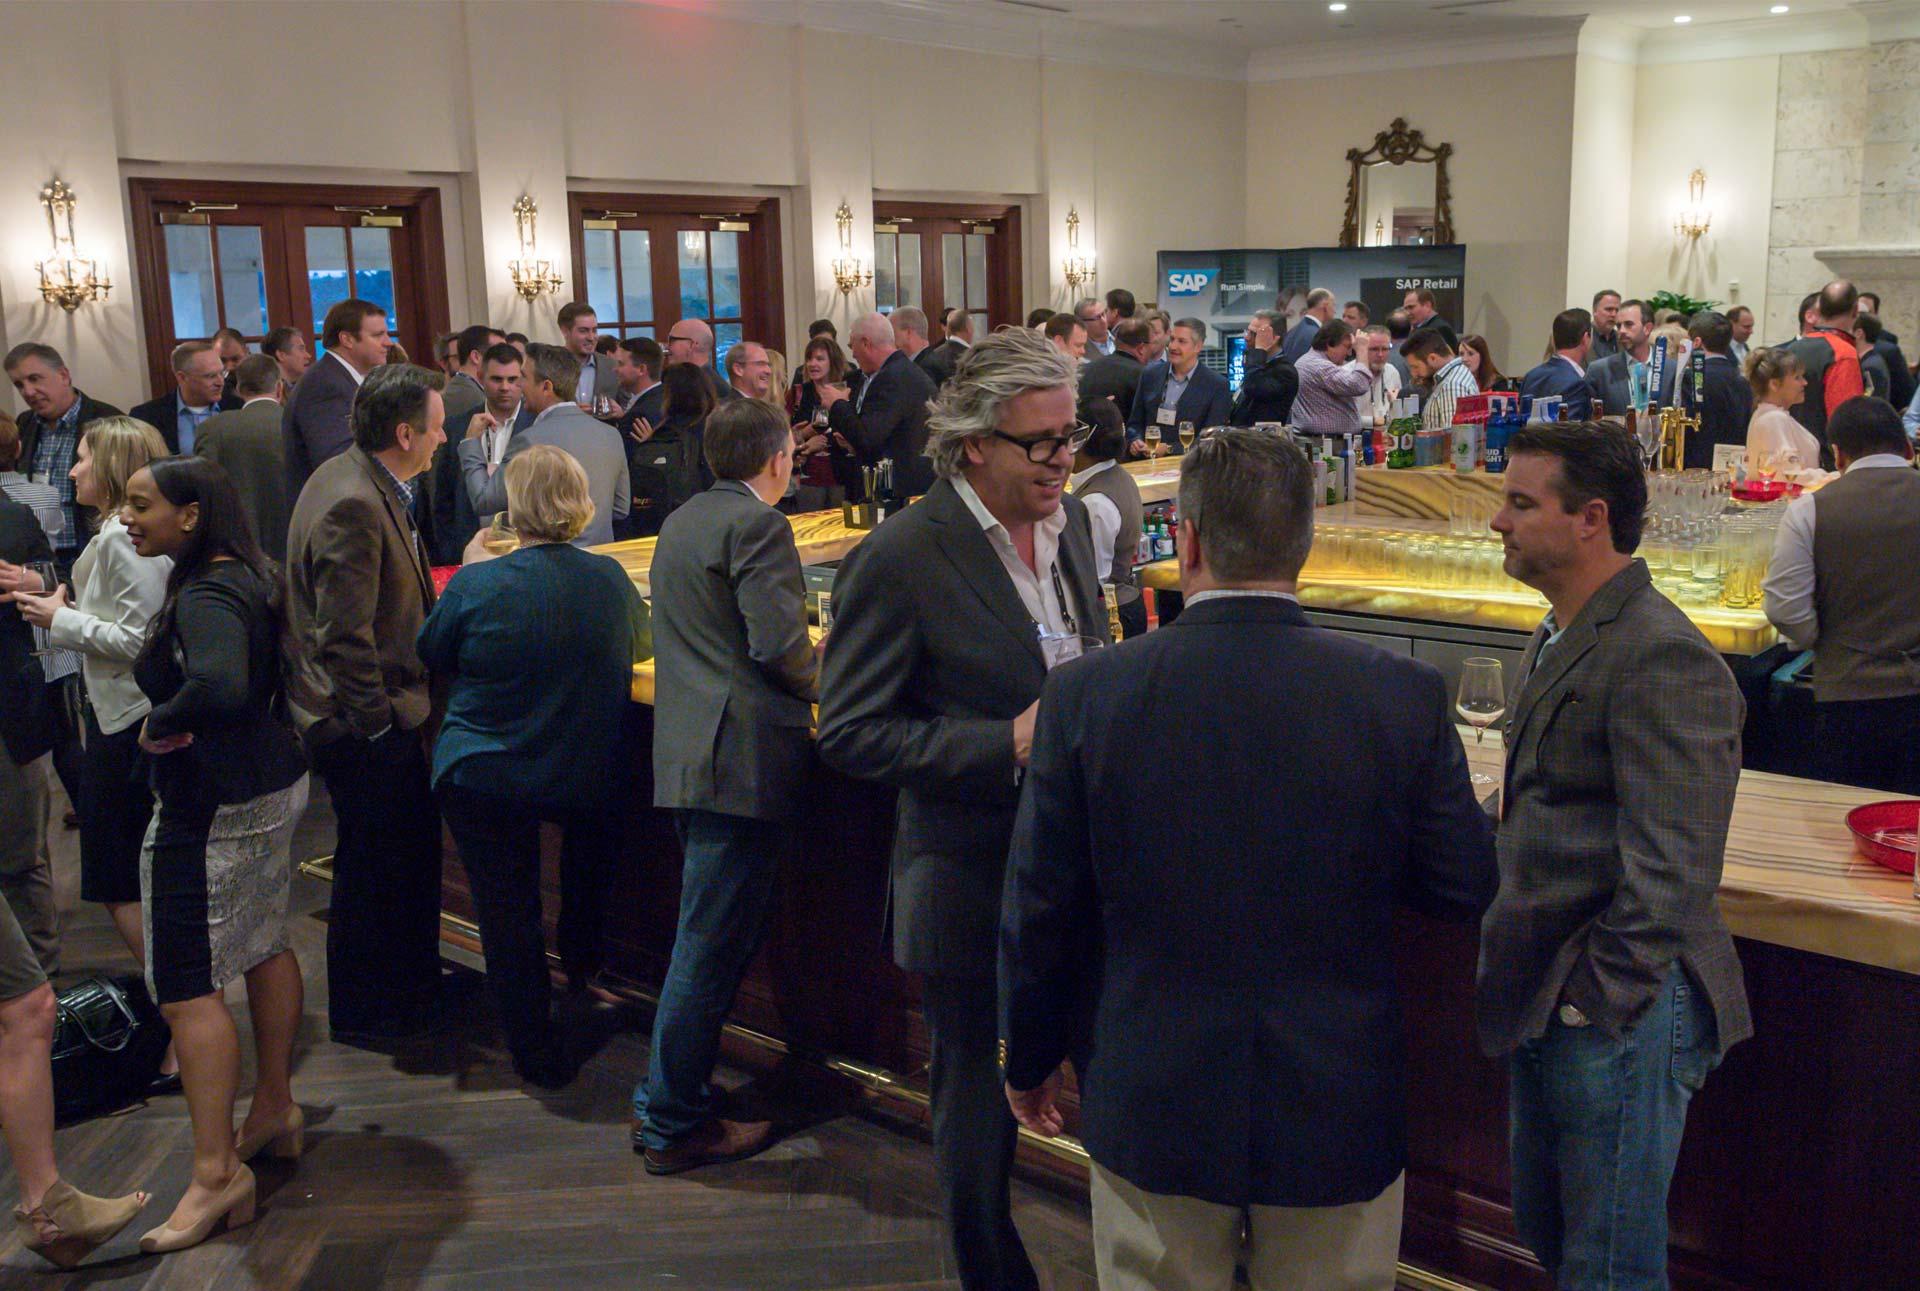 social event with a bar